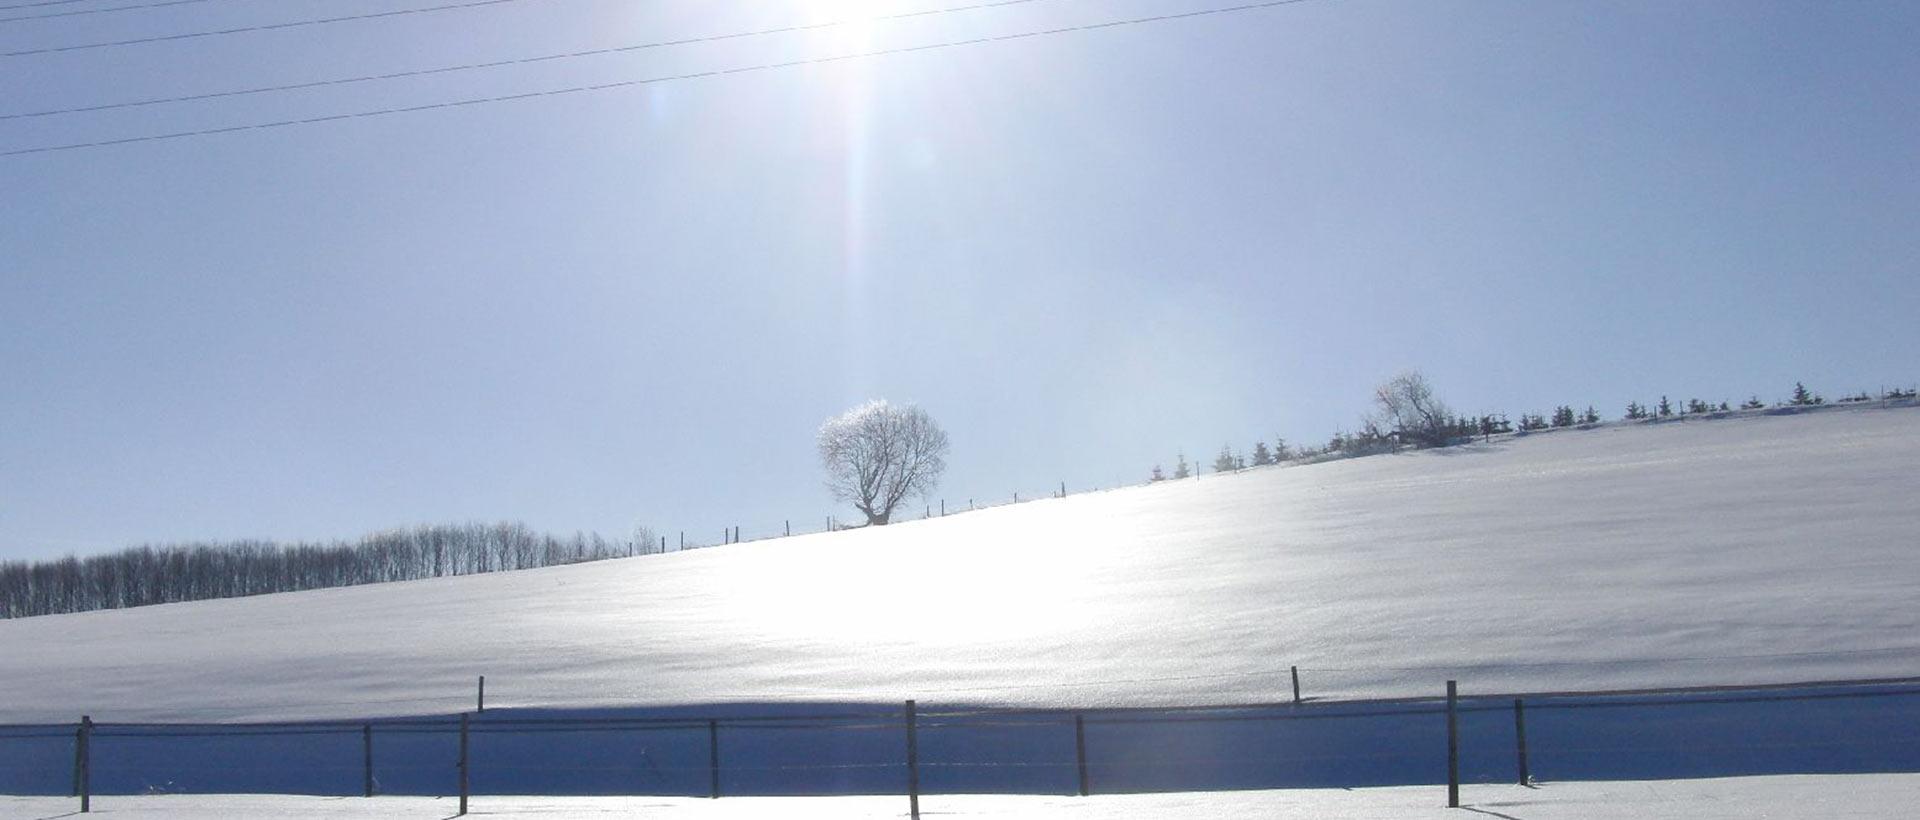 reitschule_berger_winterlandschaft_001